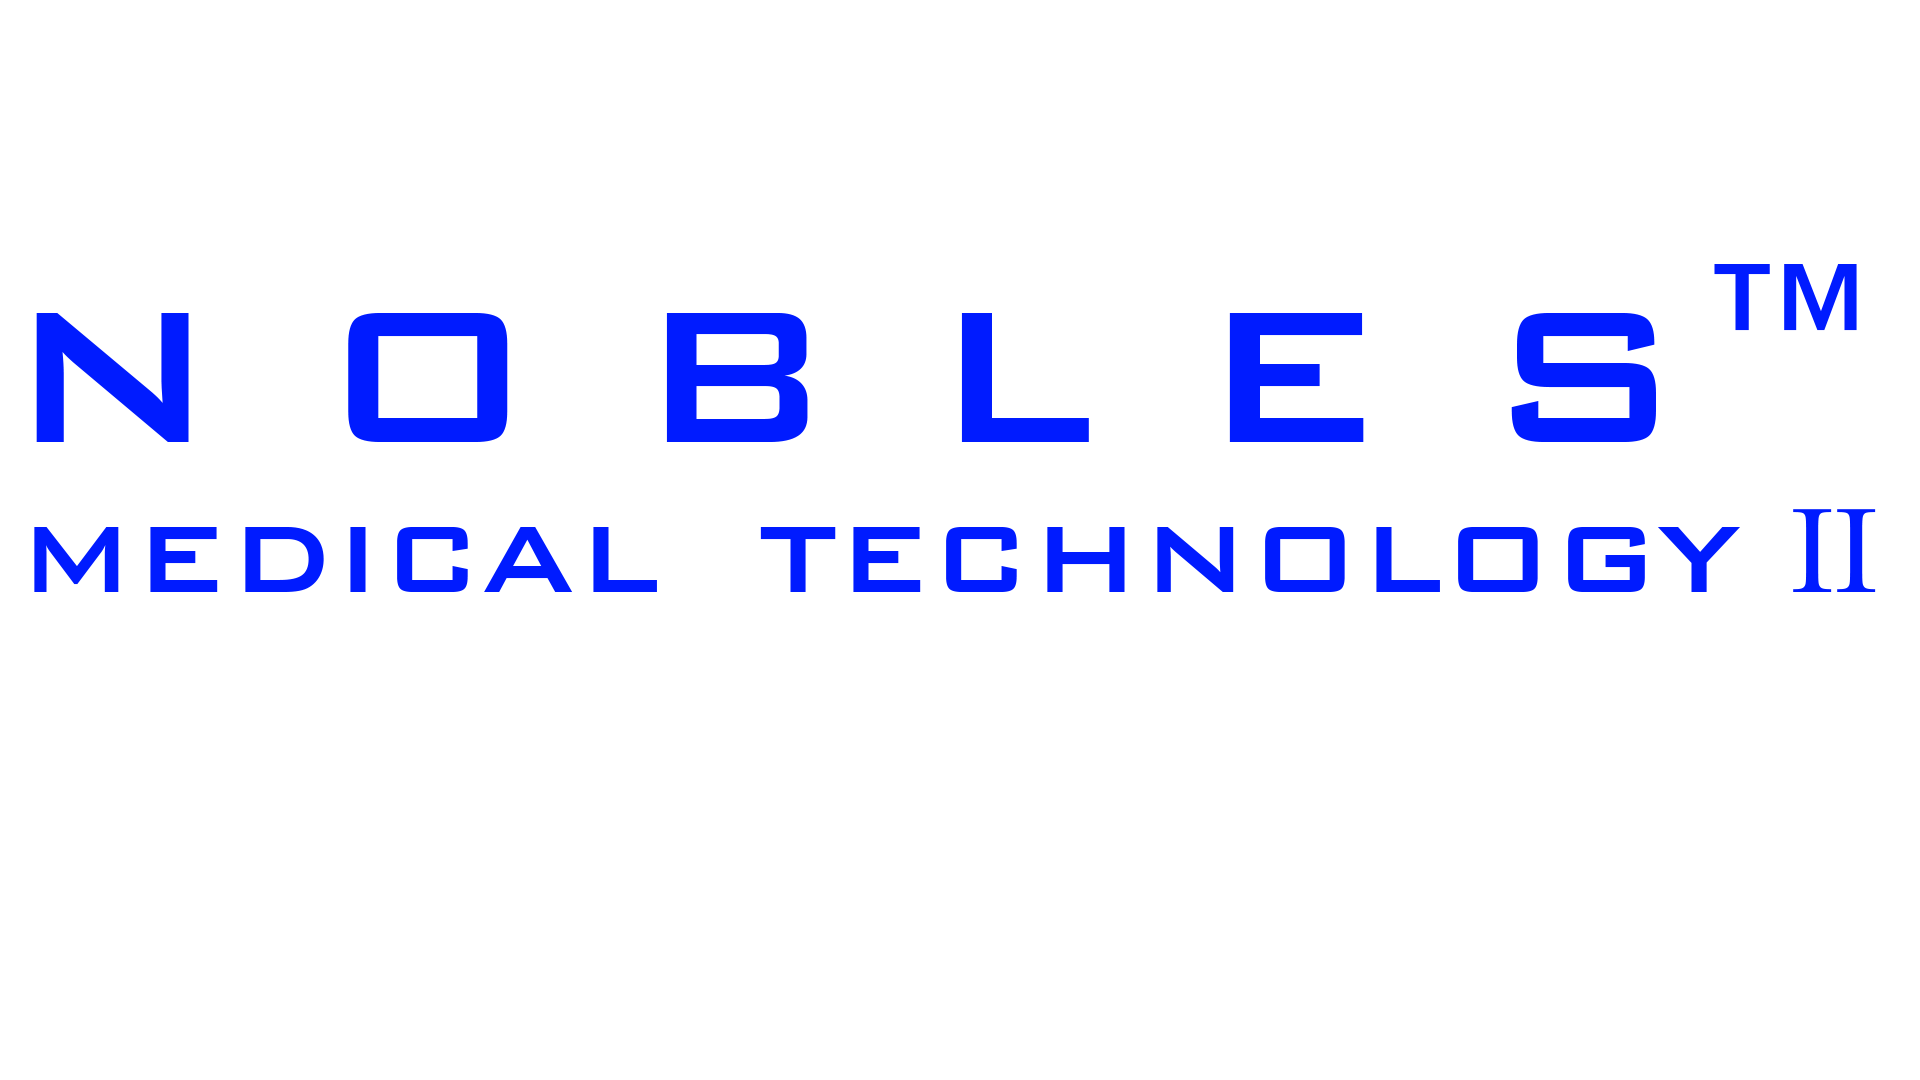 NOBLES MEDICAL TECHNOLOGY II LOGO - Heartstitch, Inc.  NOBLES MEDICAL ...